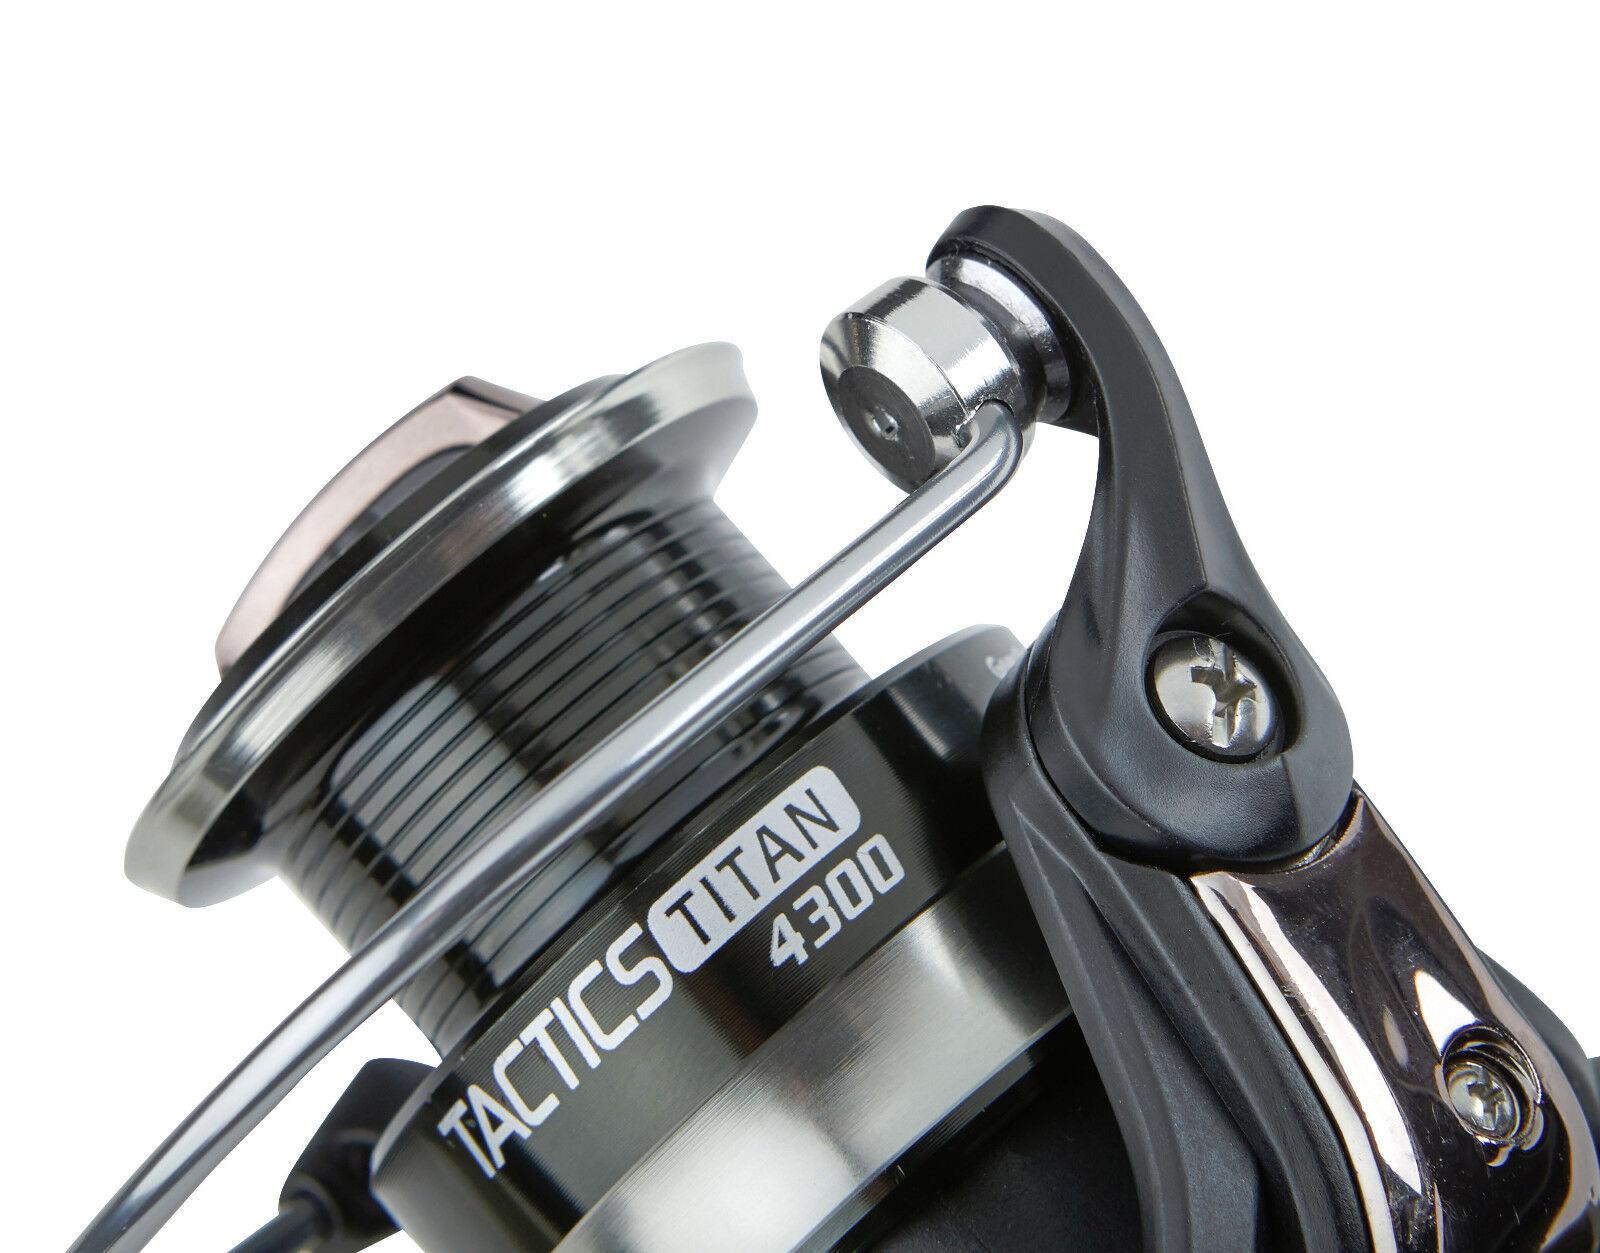 Spinnrolle TACTICS Titan 4200 FD, 3 + + + 1   140m-0,25mm  | Großhandel  640623